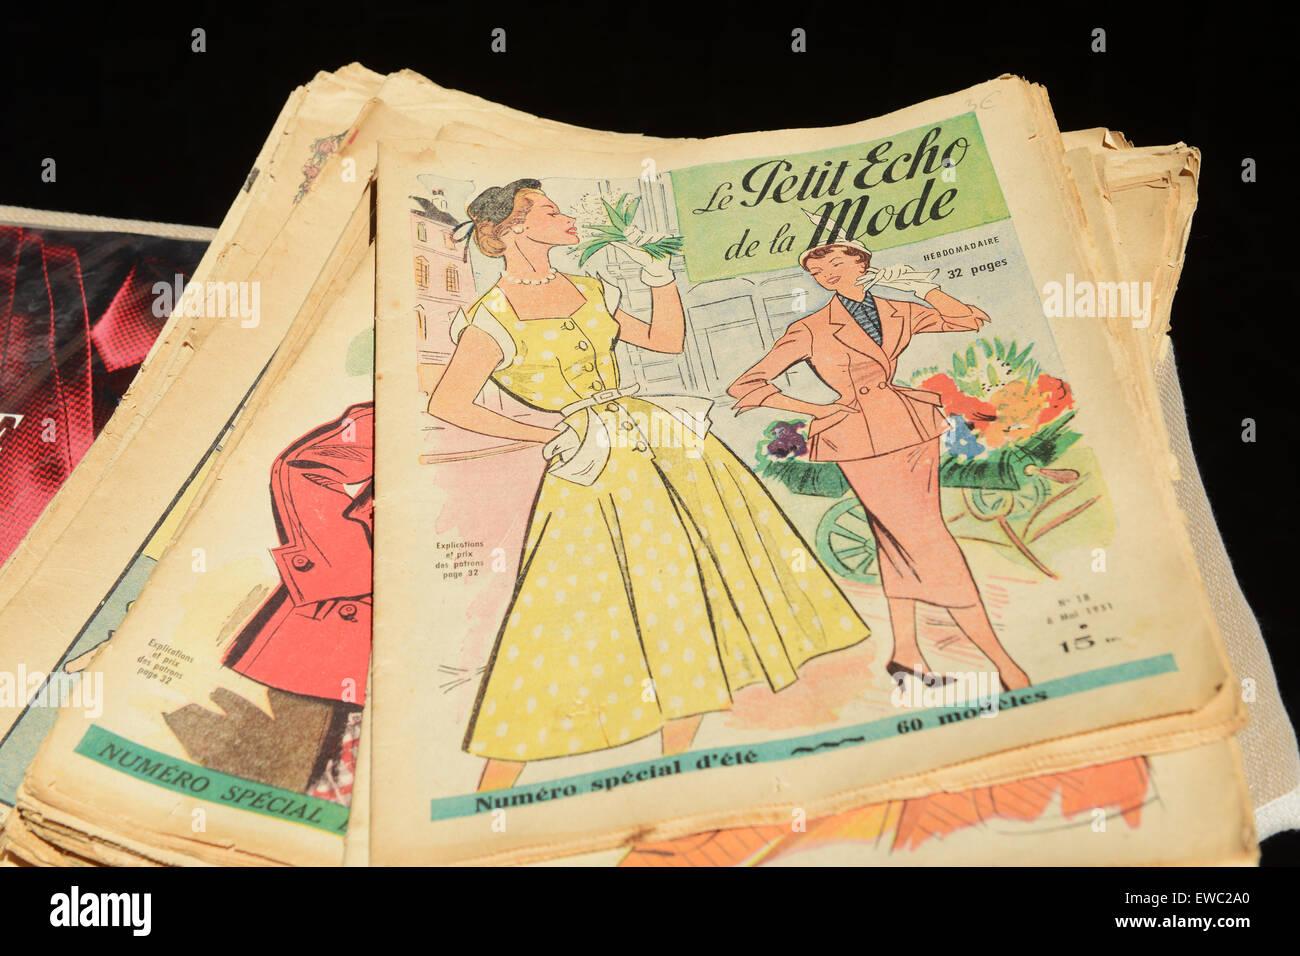 French fashion magazine Le Petit Echo de La Mode - Stock Image